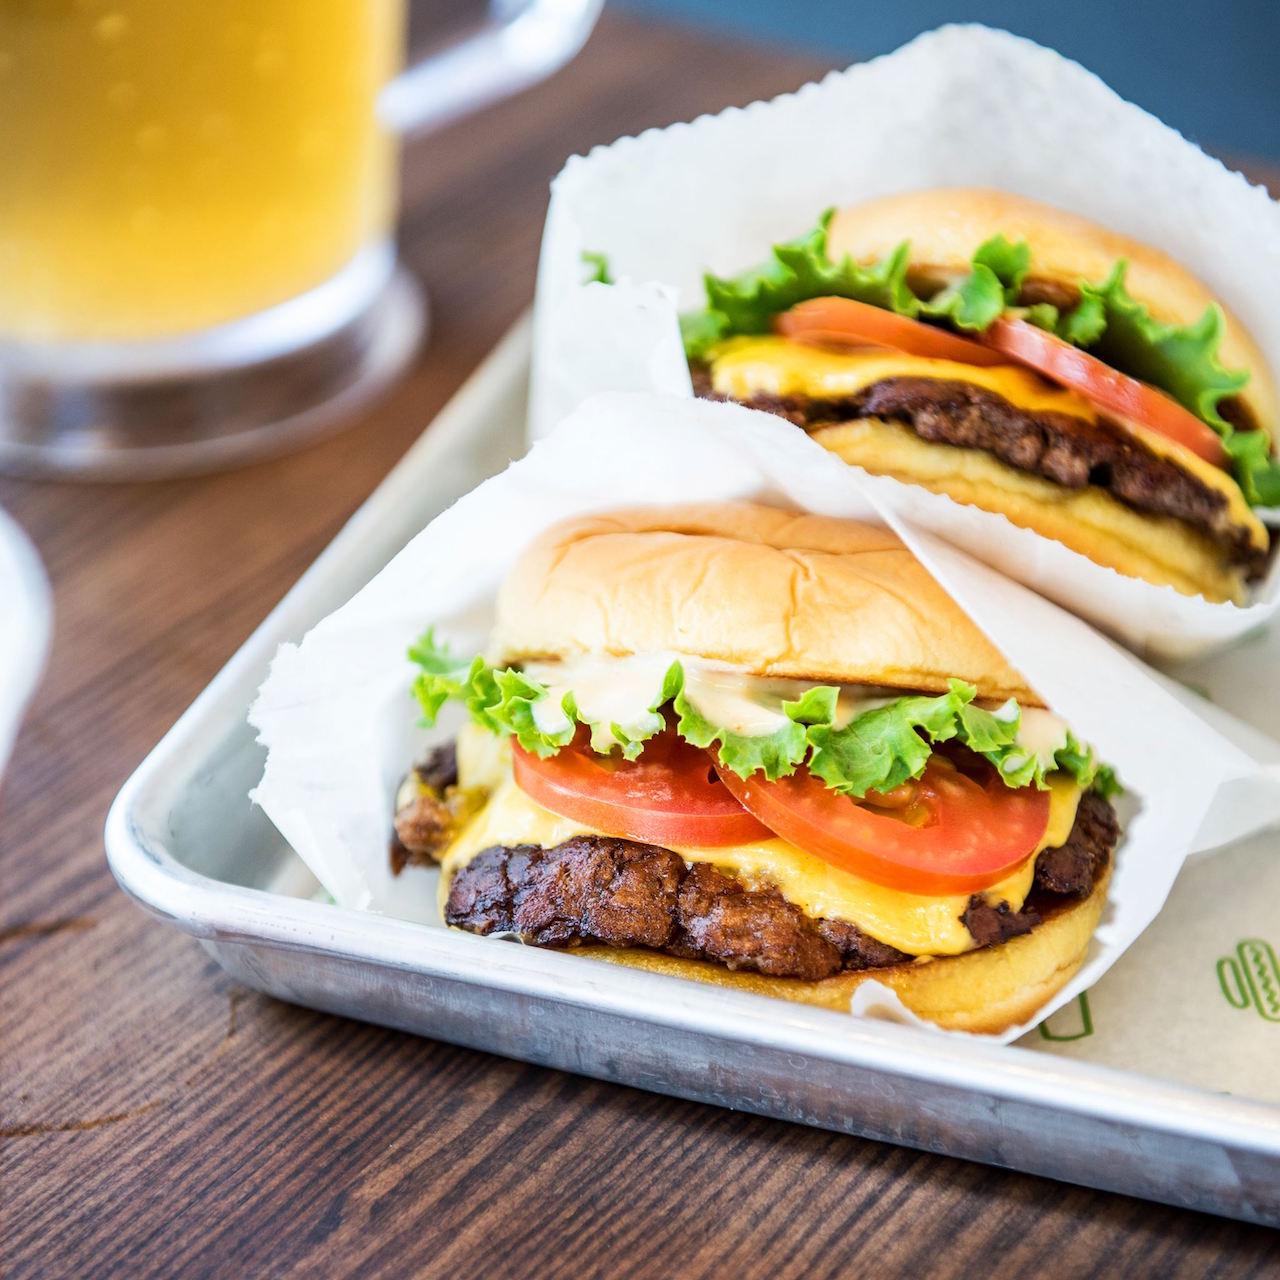 Burger deliciousness